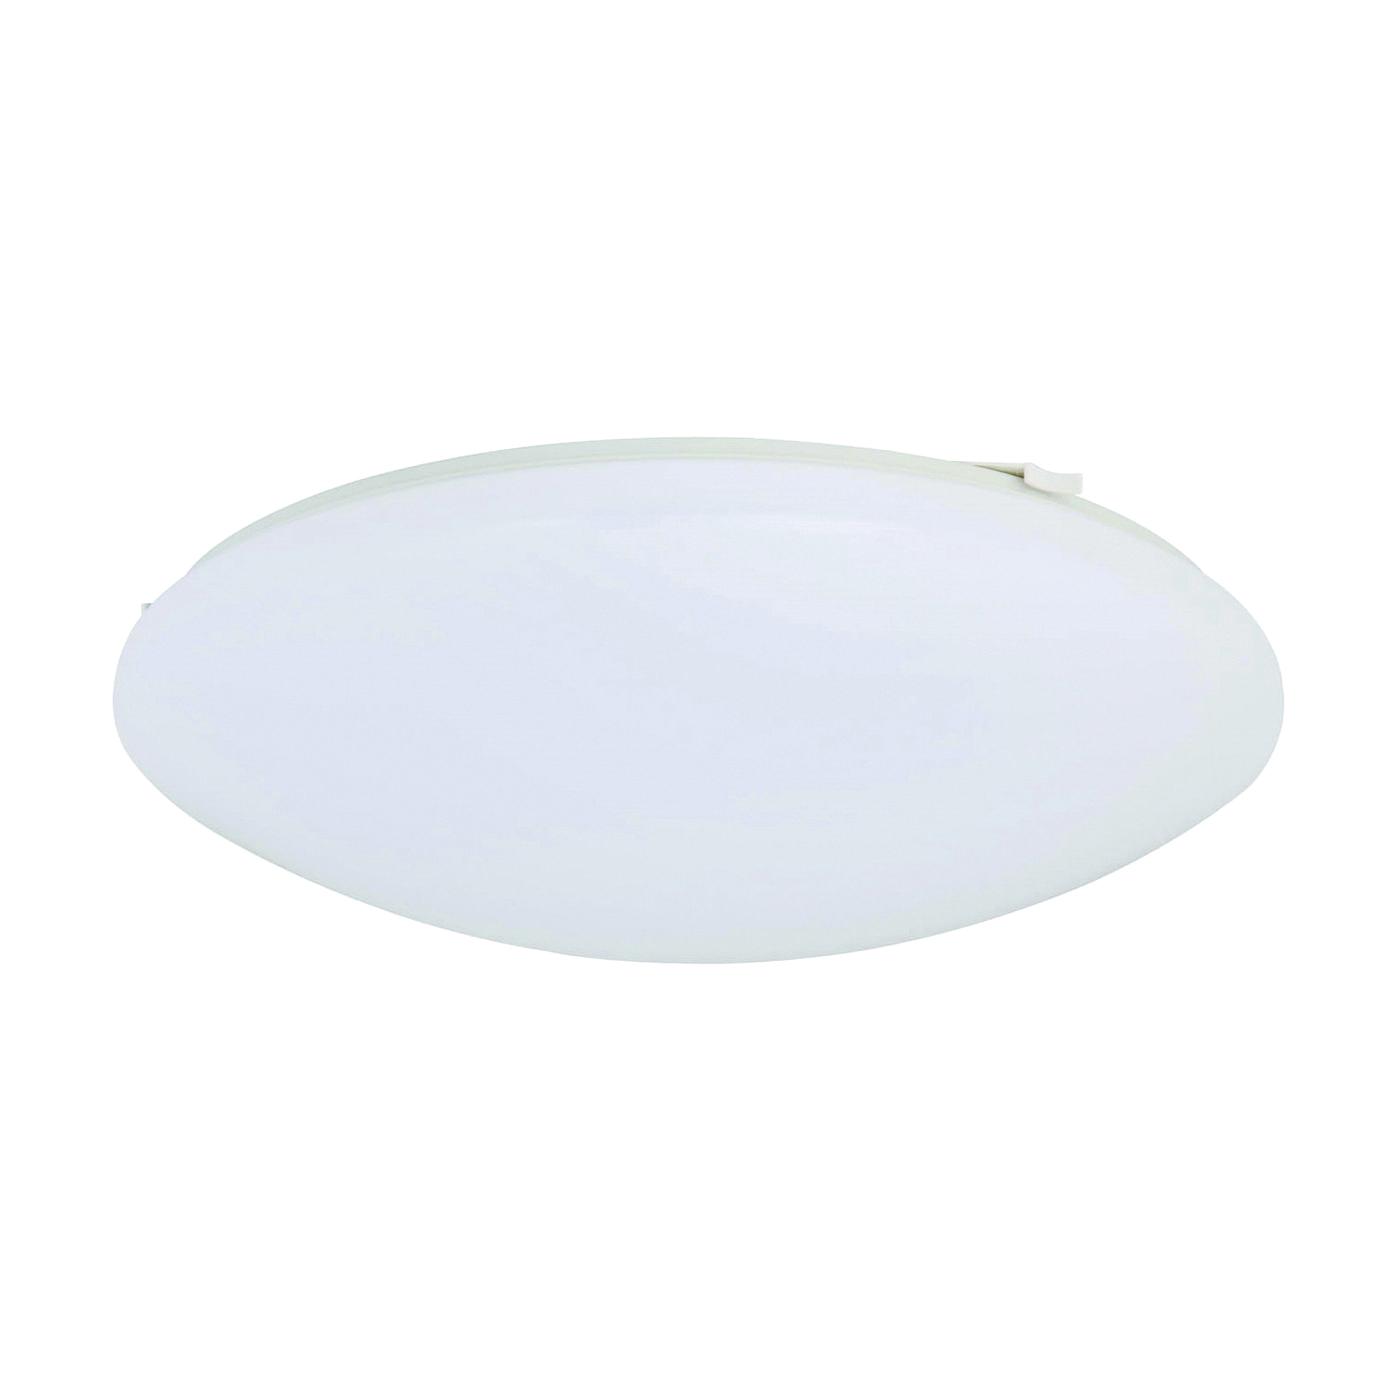 Picture of ETI 54437241 Low-Profile Light Fixture, 120/277 V, 22 W, LED Lamp, 1600 Lumens, 4000 K Color Temp